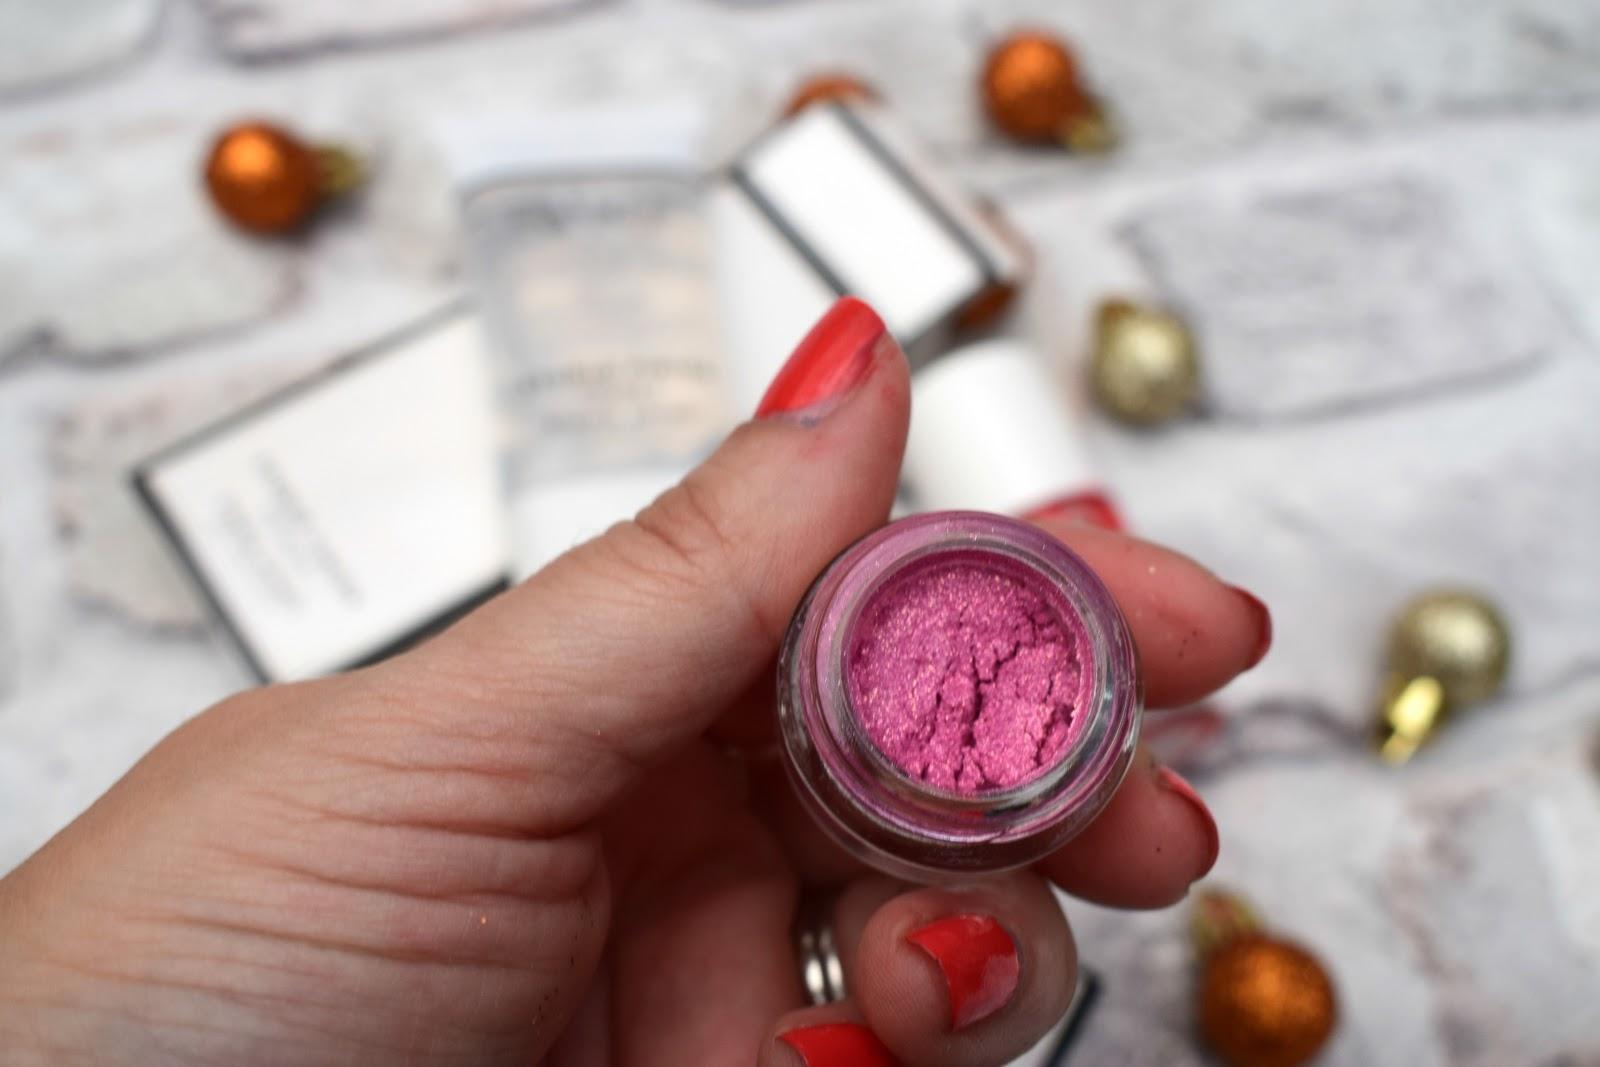 Wonderland makeup review